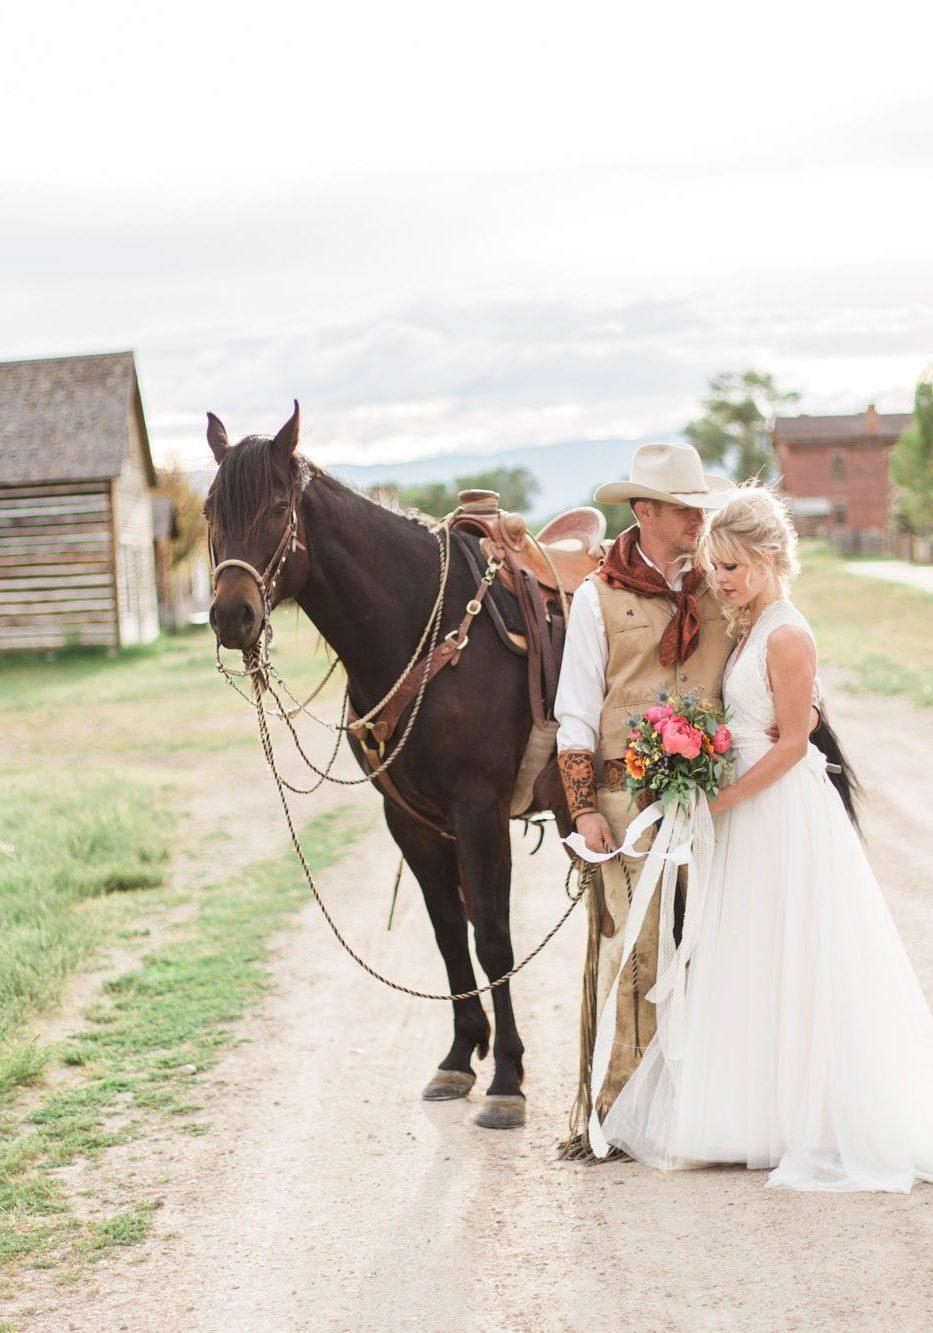 Old West Wedding Inspiration in Bannack, Montana